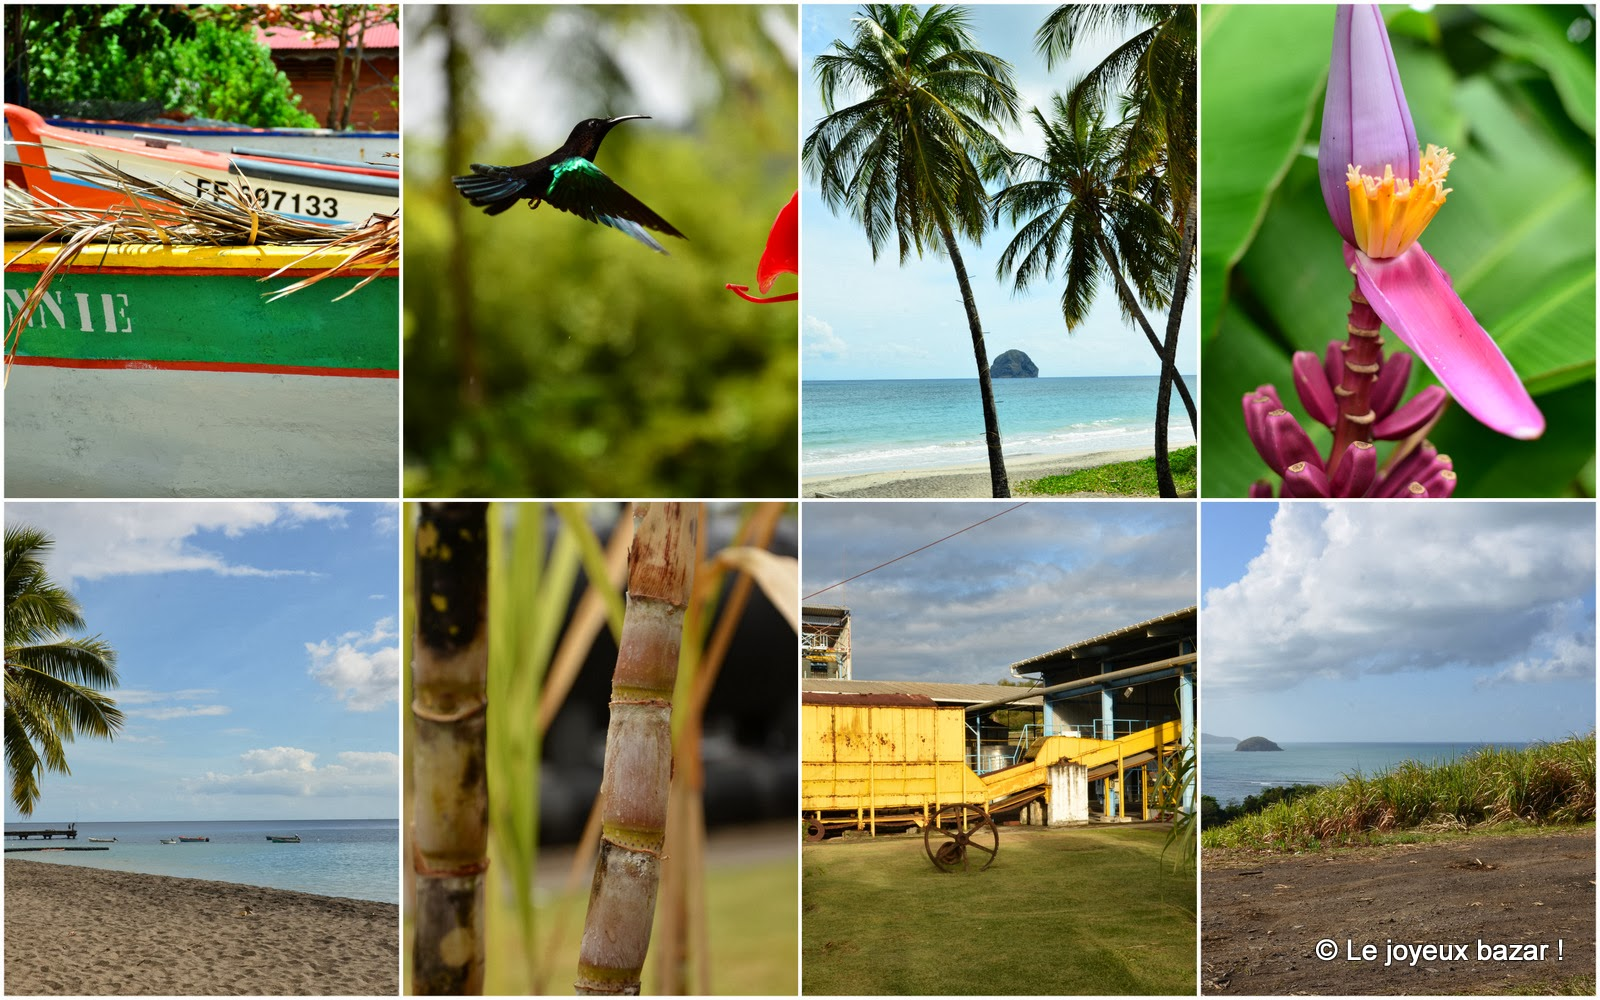 http://joyeuxbazar.blogspot.fr/search/label/Martinique